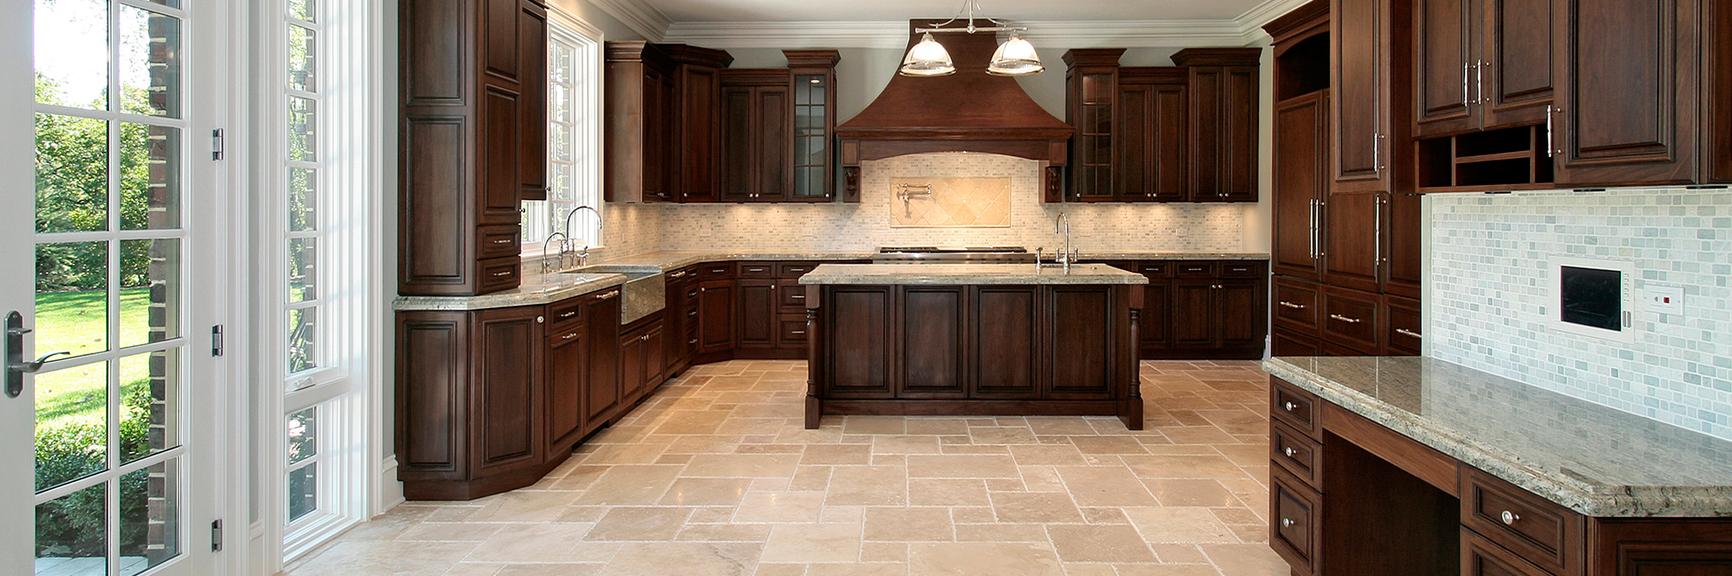 Tiles For Floors In Kitchen Tile Installation Casa Grande Az Free In Home Estimates